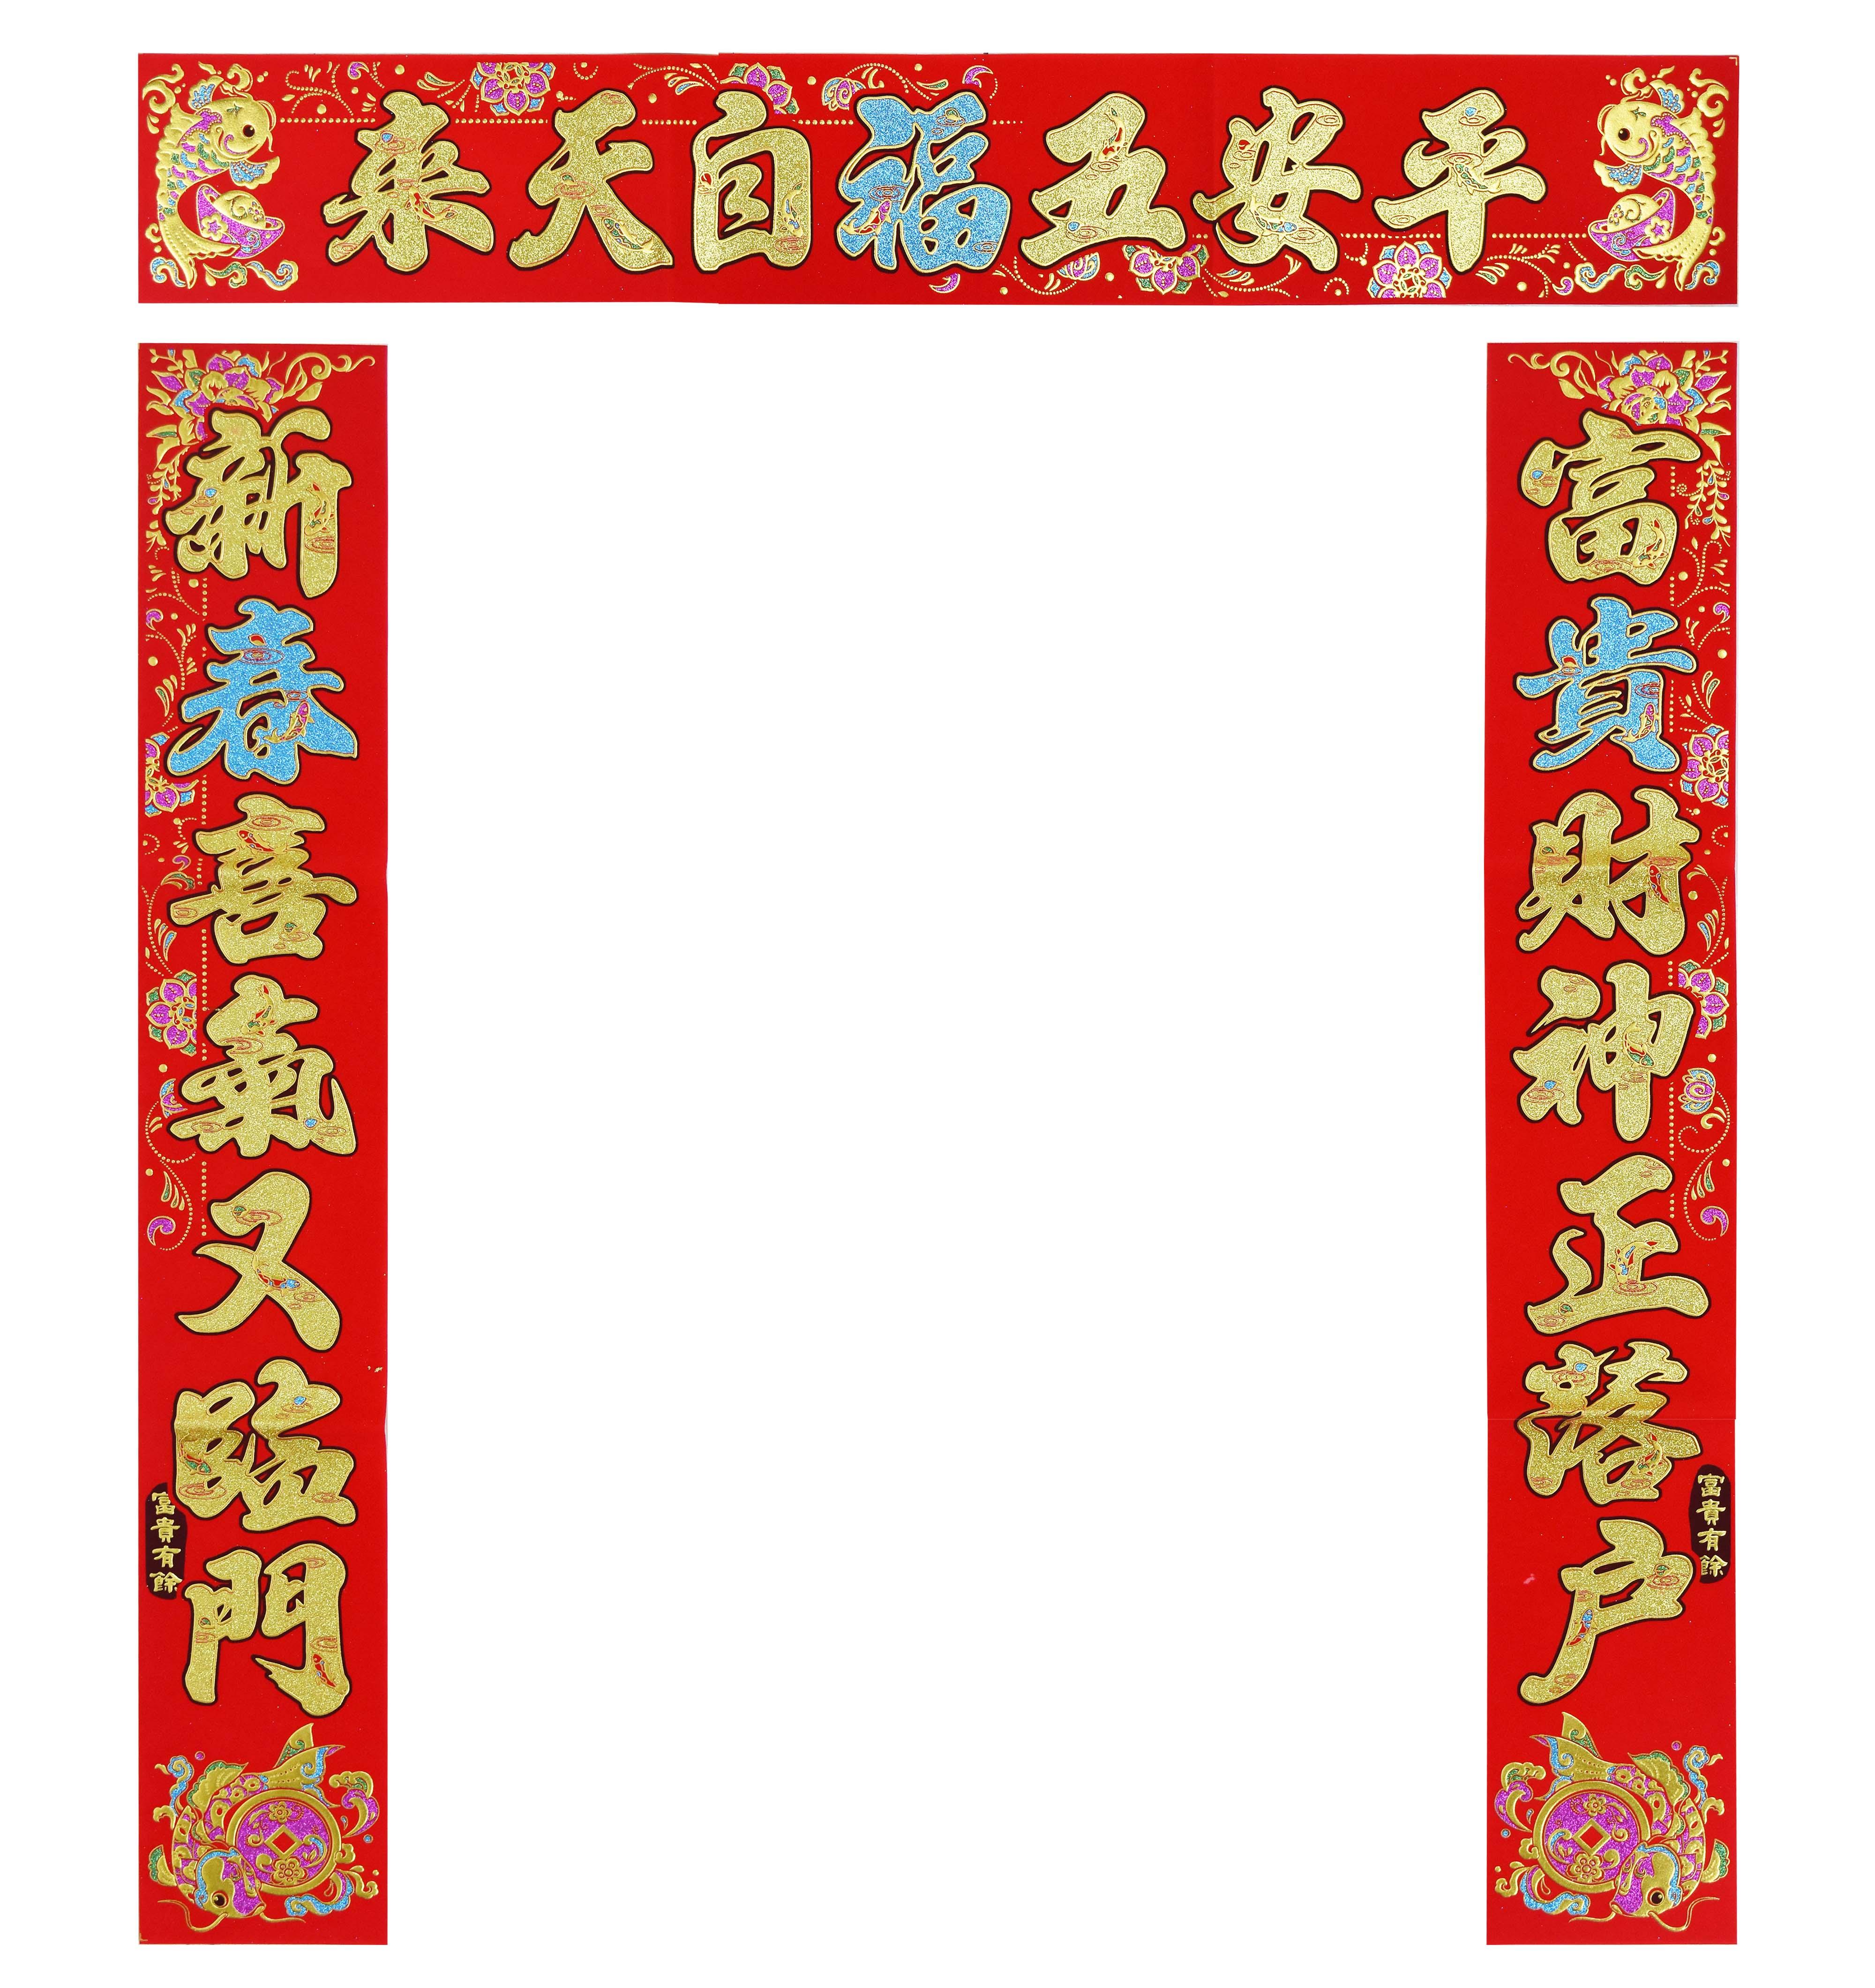 X射線【Z656828】絨布雙色金門聯,春聯/字貼/佈置/過年/雞年/門貼/對聯/住家